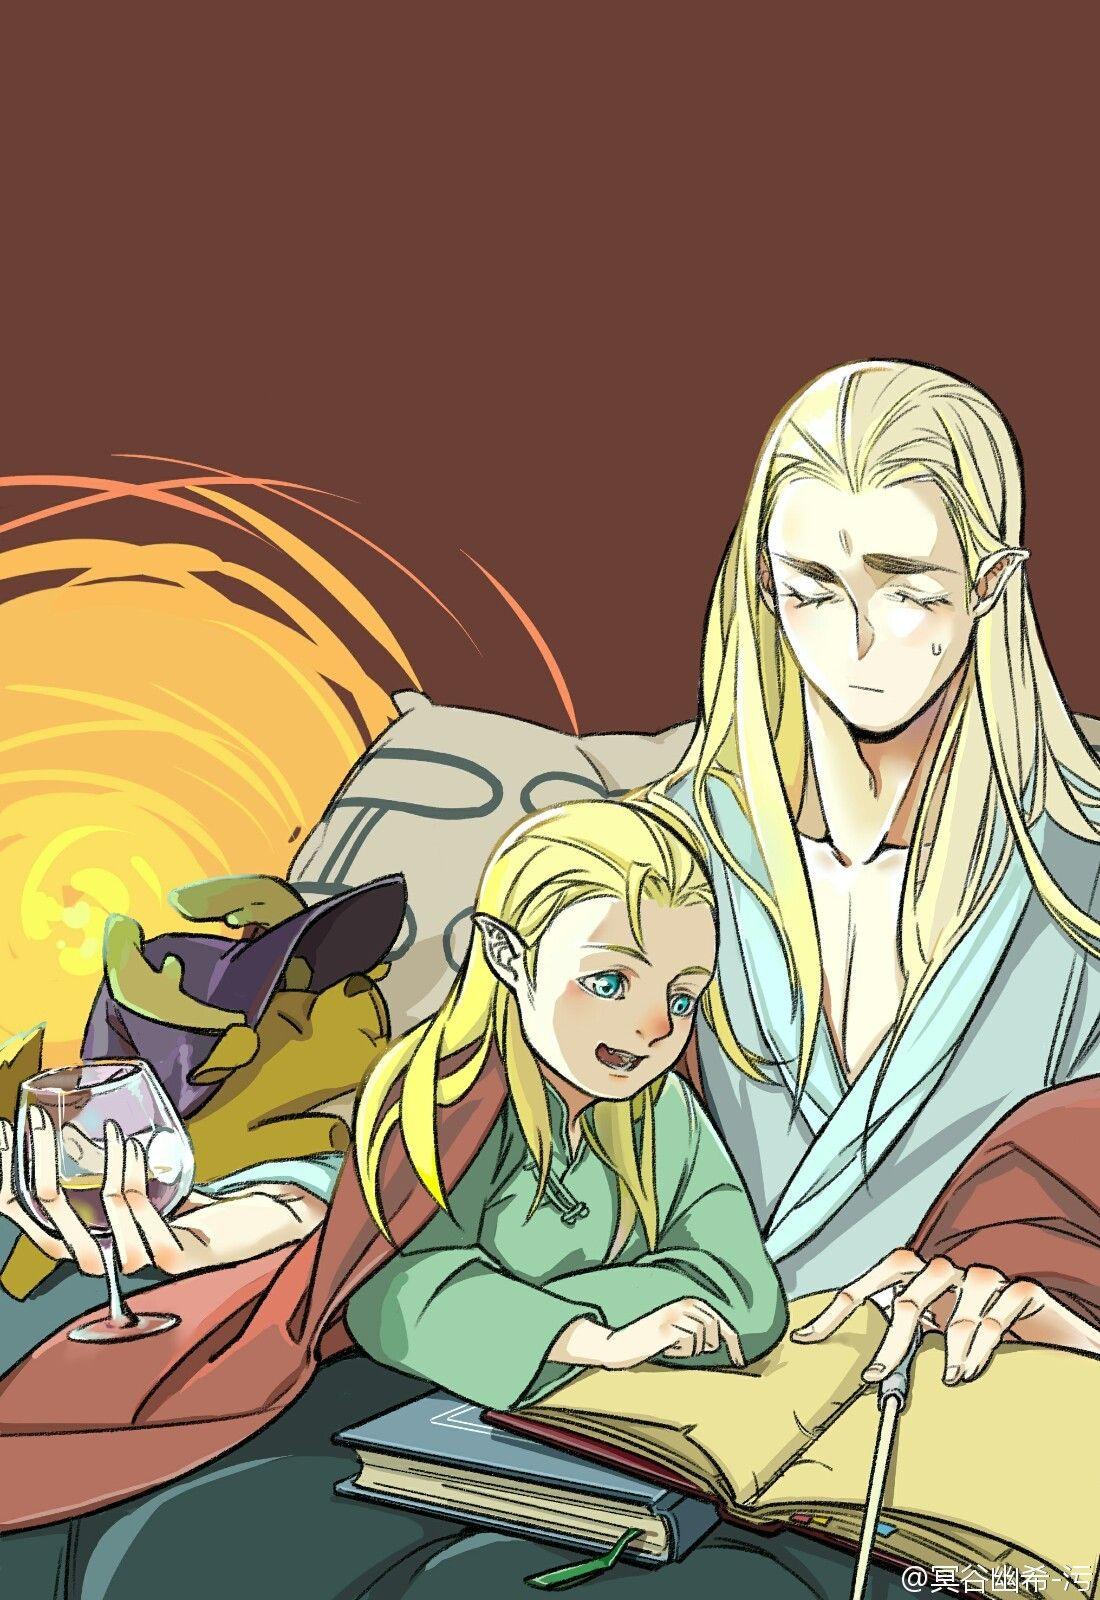 Legolas Sleeping Images - Reverse Search